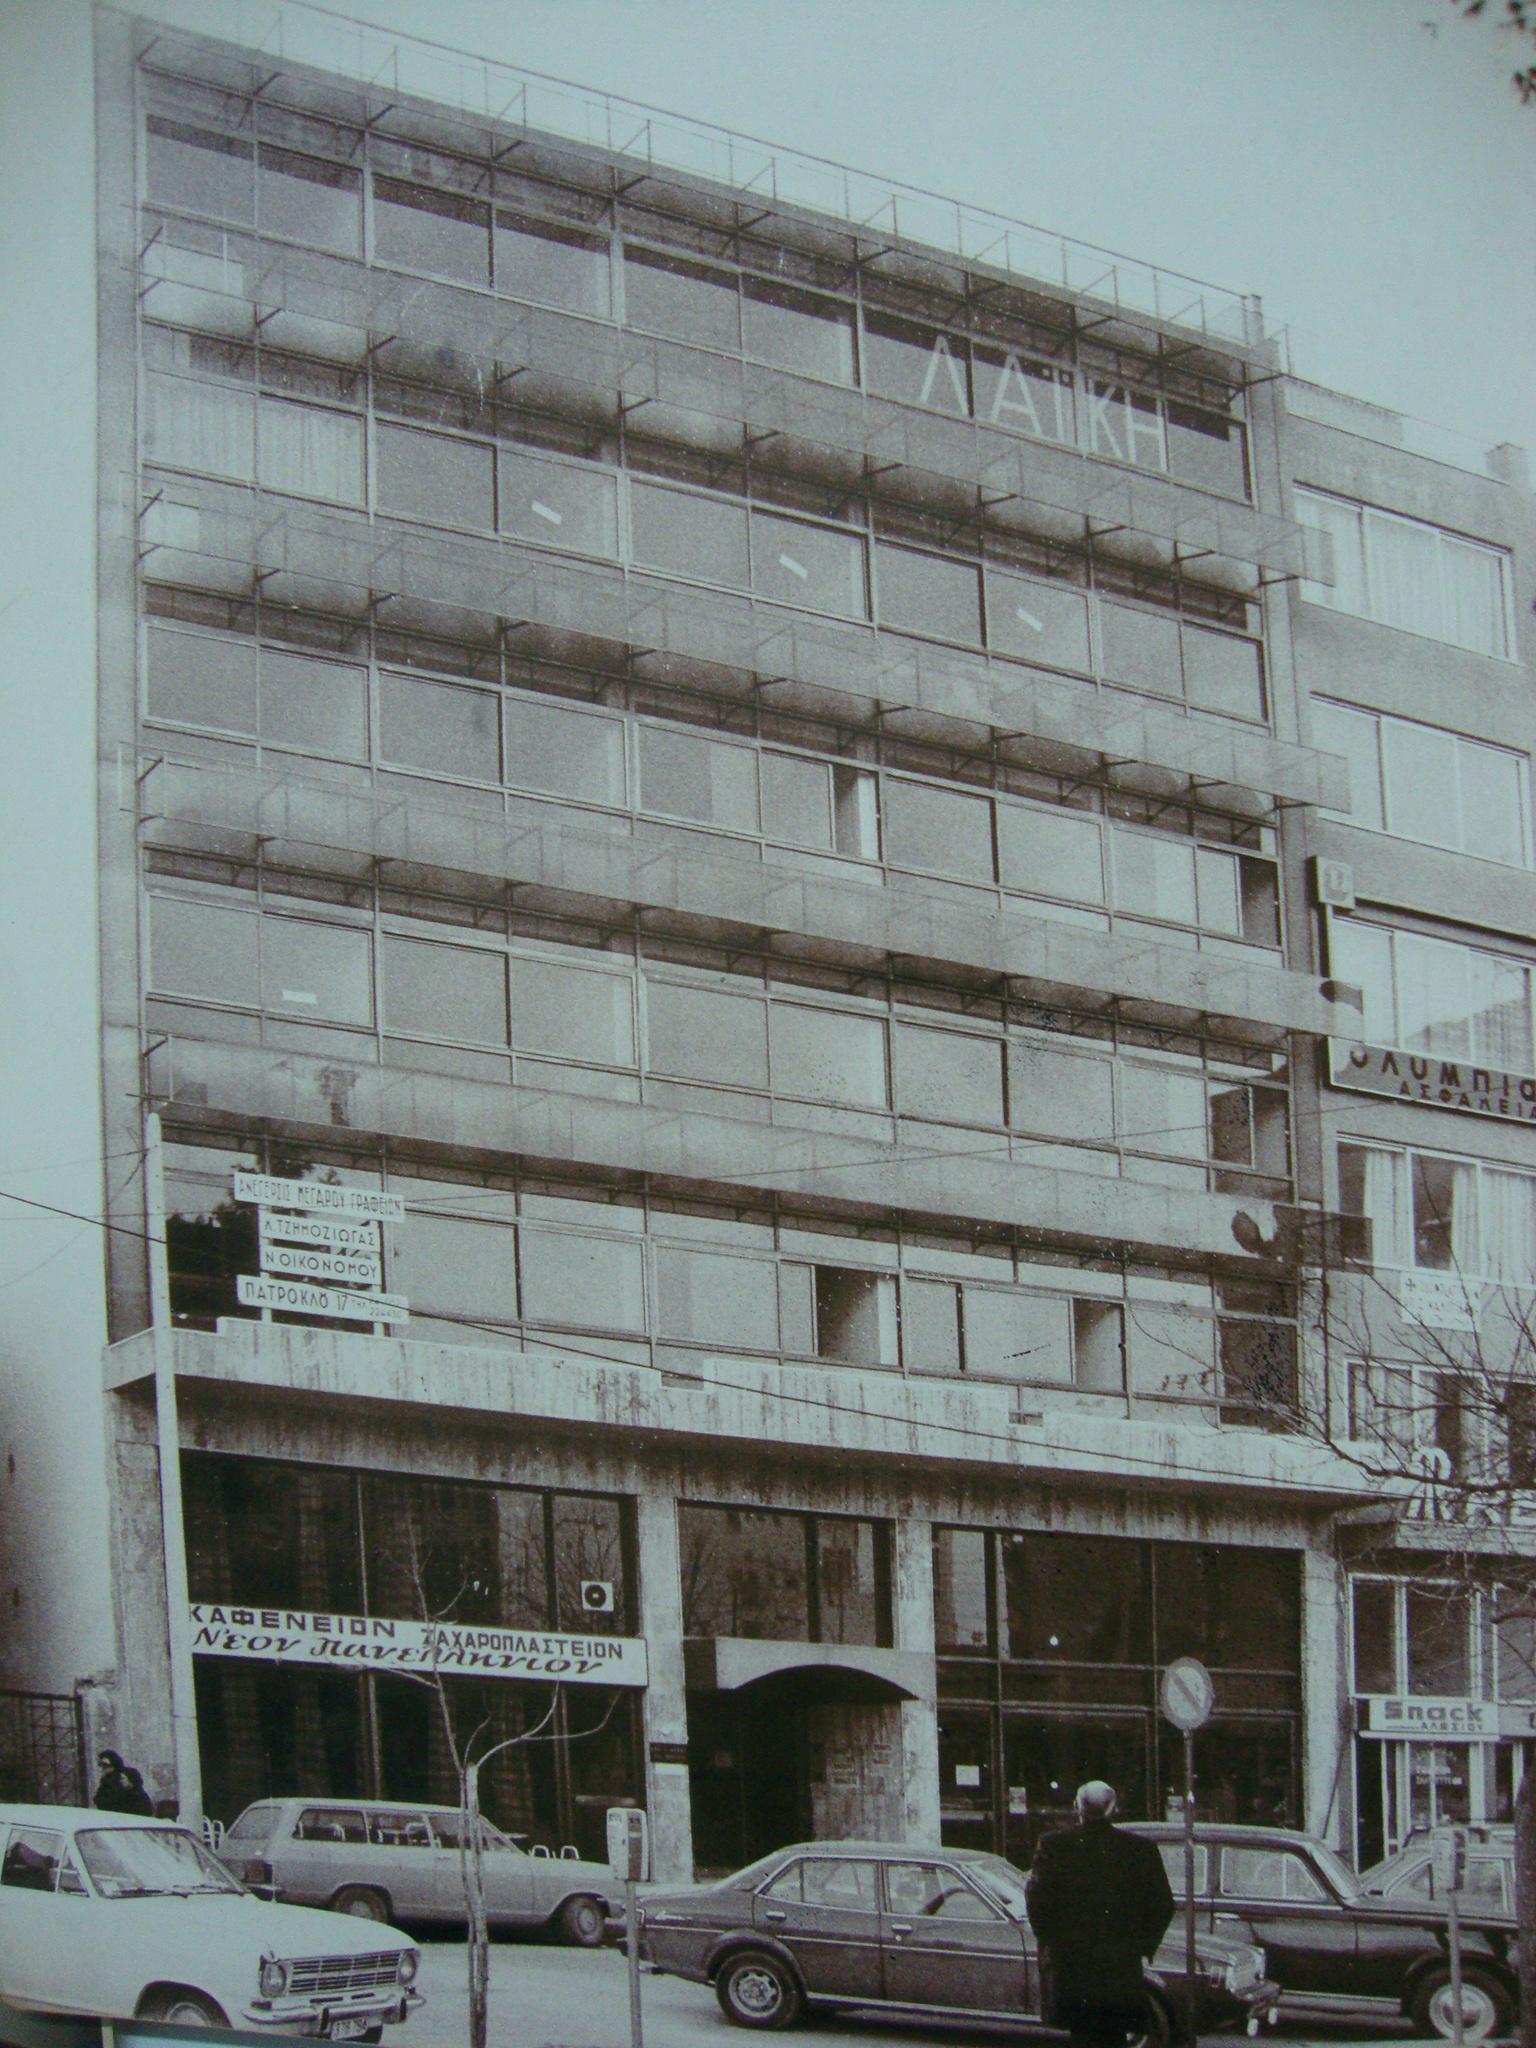 property sales-construction-1975-project manager-civil engineer Leonidas Tzimoziogas